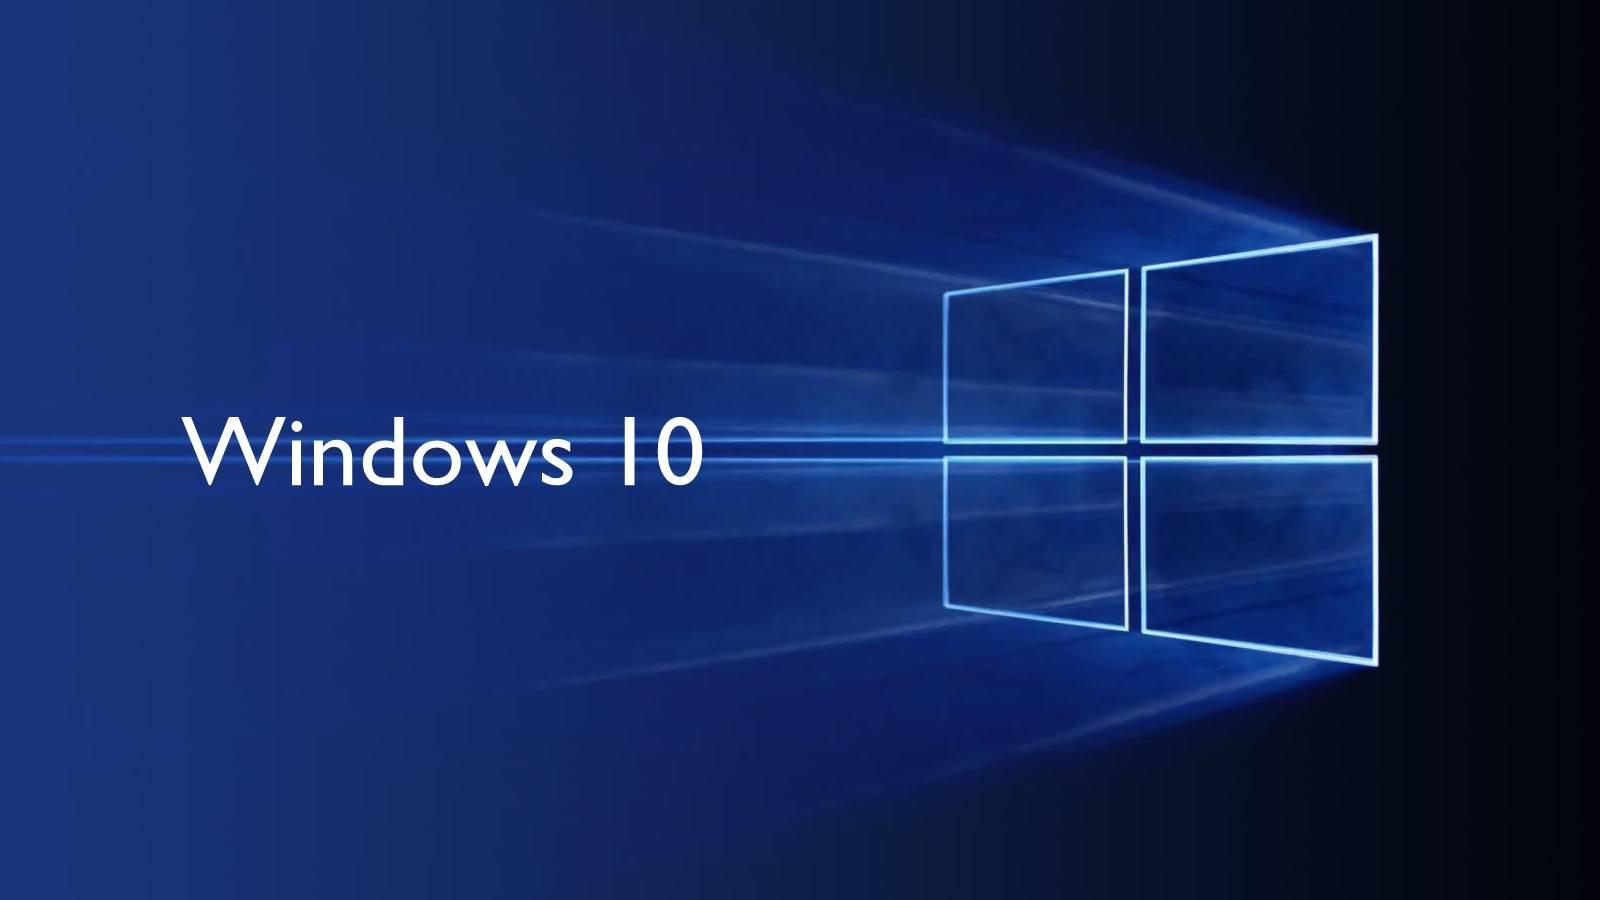 Windows 10 imbunatatiri